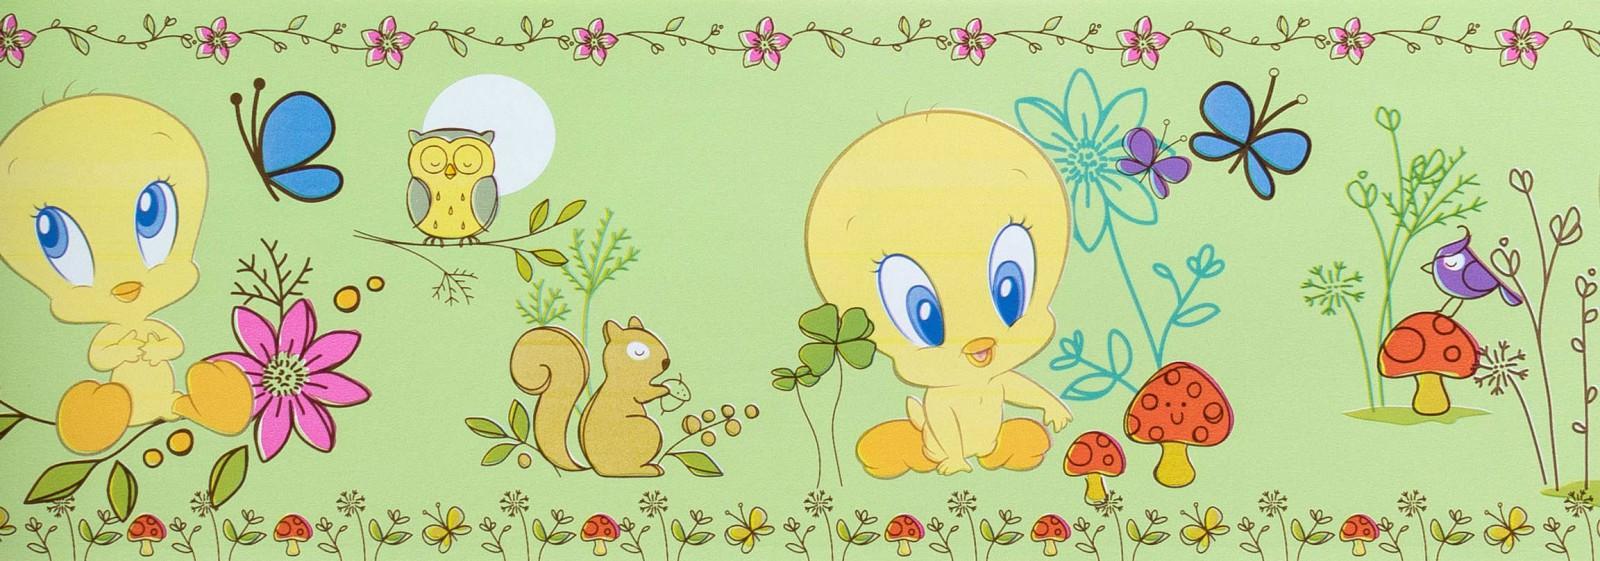 Baby looney tunes wallpaper border - photo#10